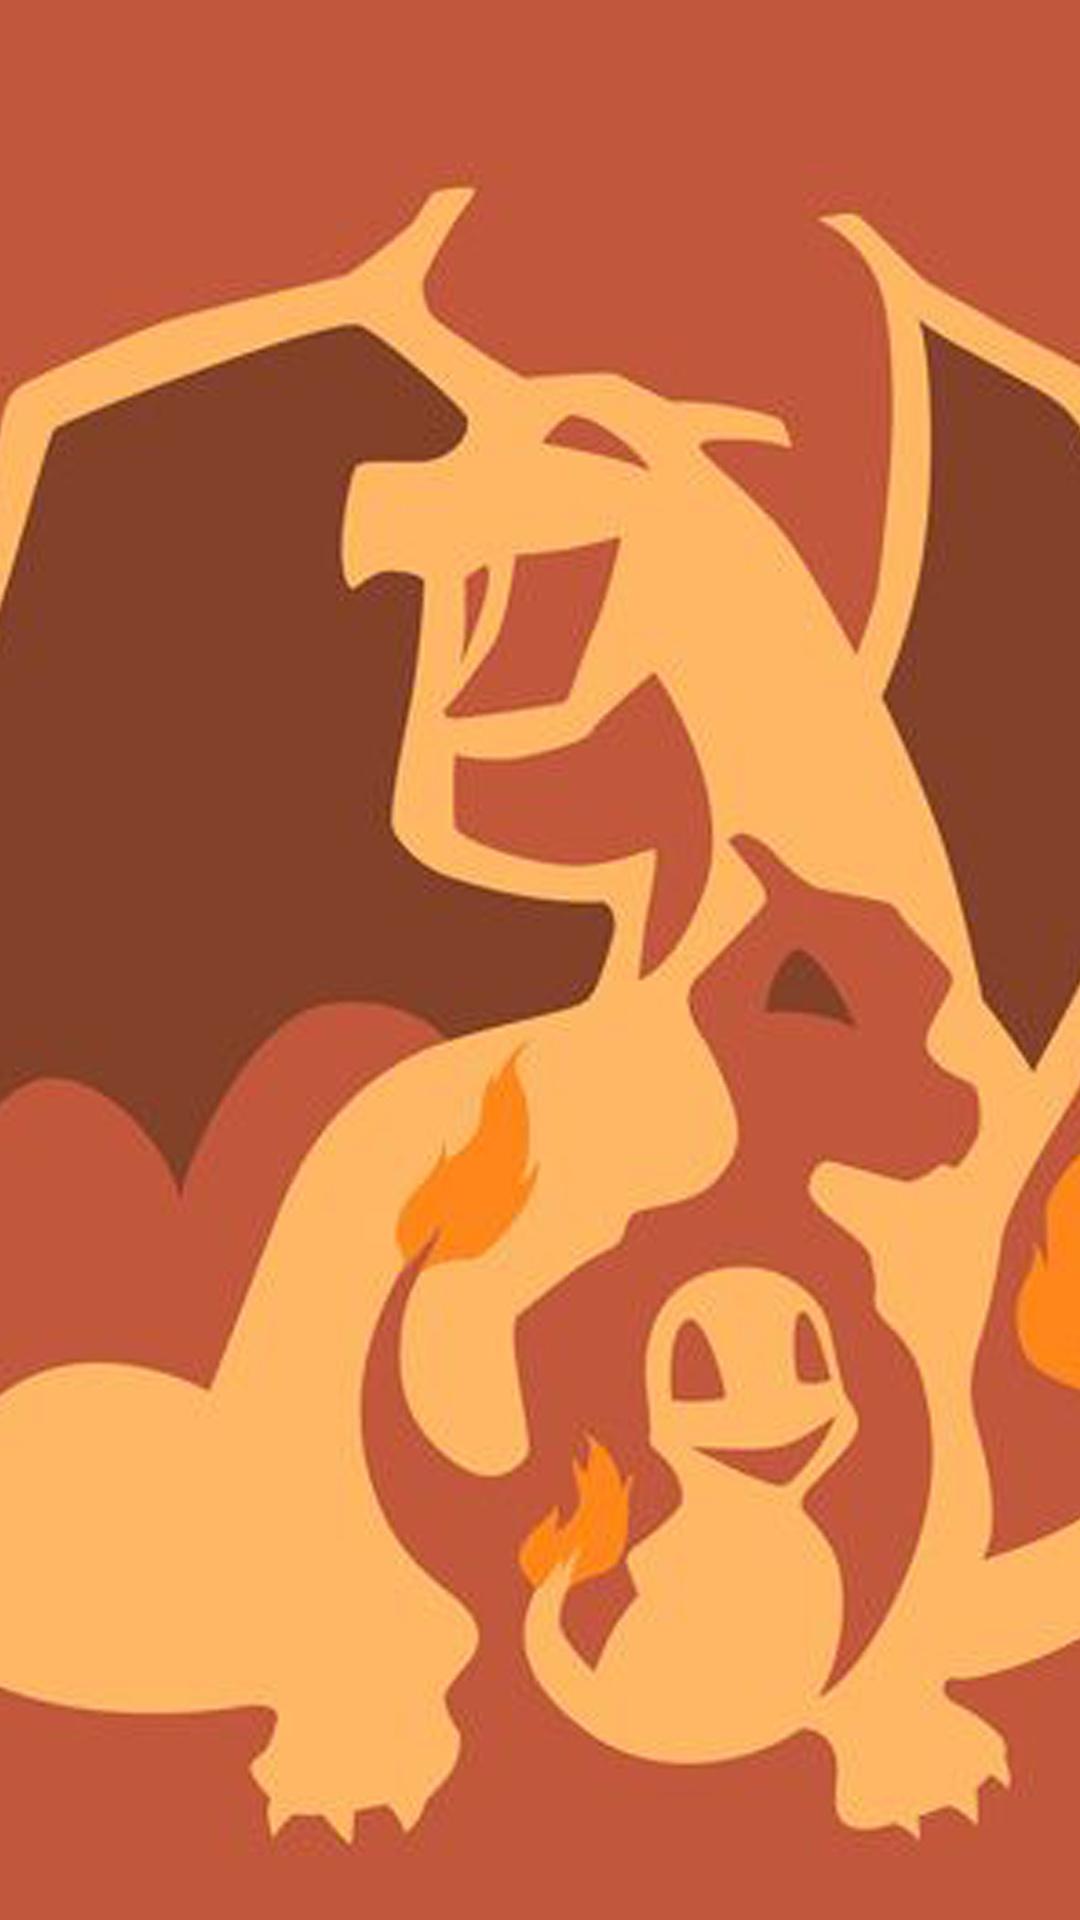 Charizard Pokemon Iphonex Wallpapers Iphone Wallpaper